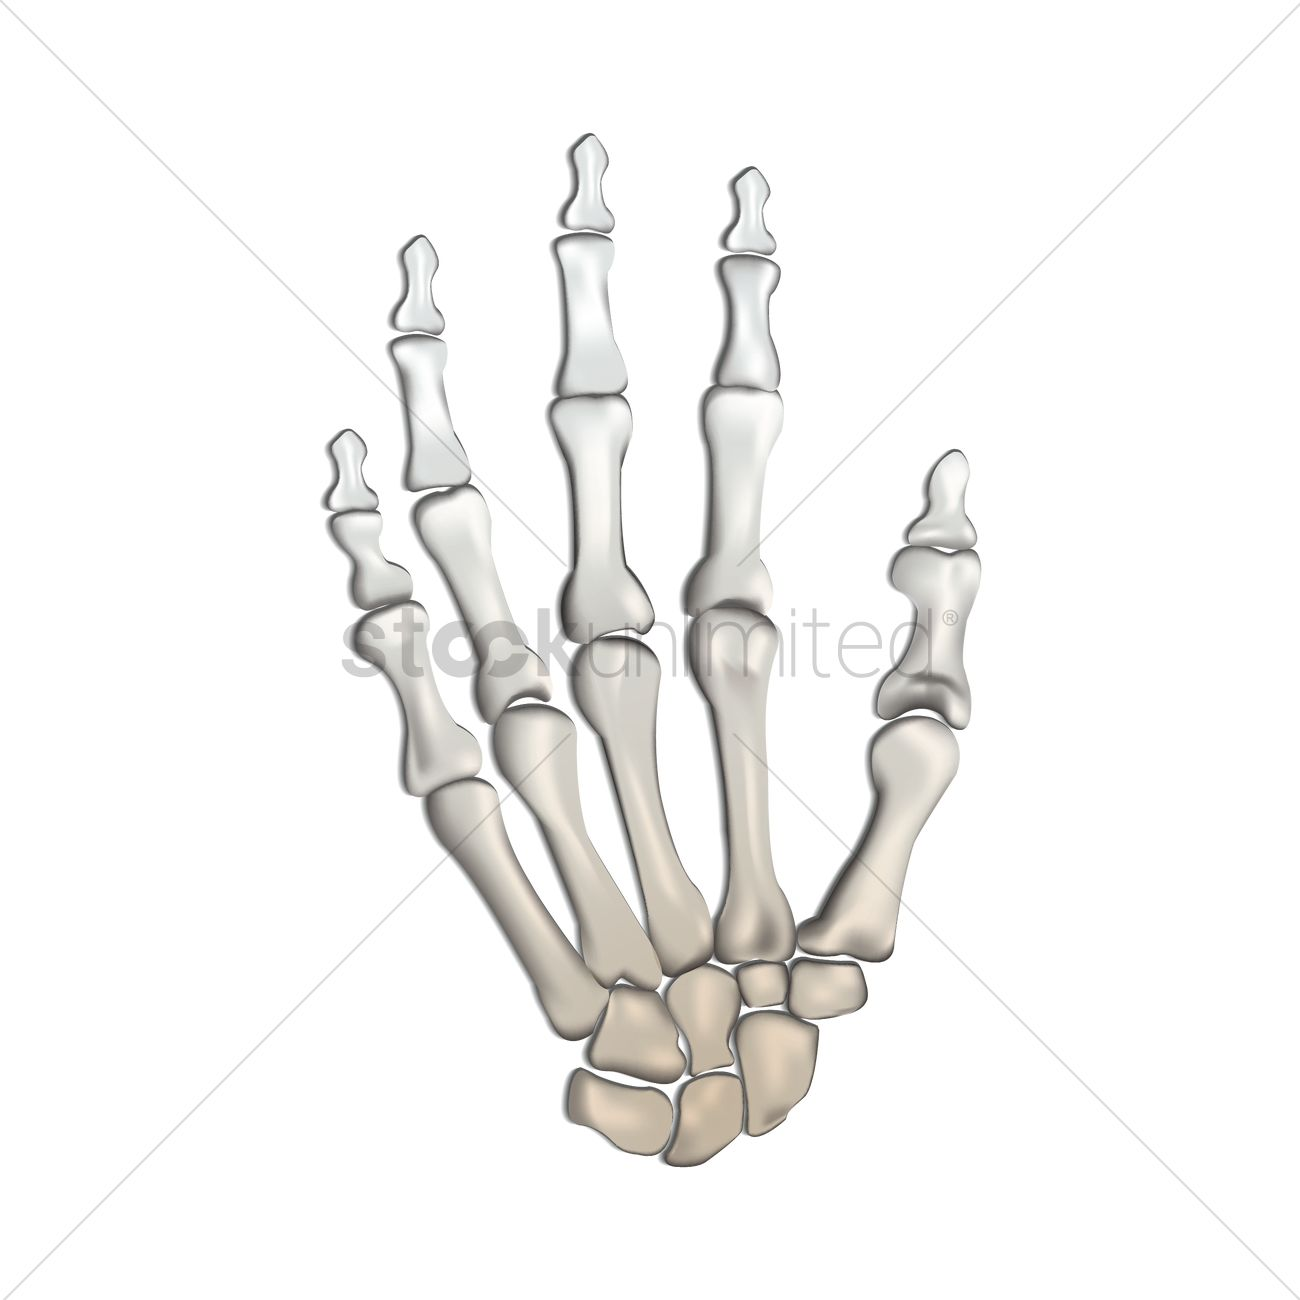 human hand skeleton diagram 3 wire rtd wiring bones of vector image 1815224 stockunlimited